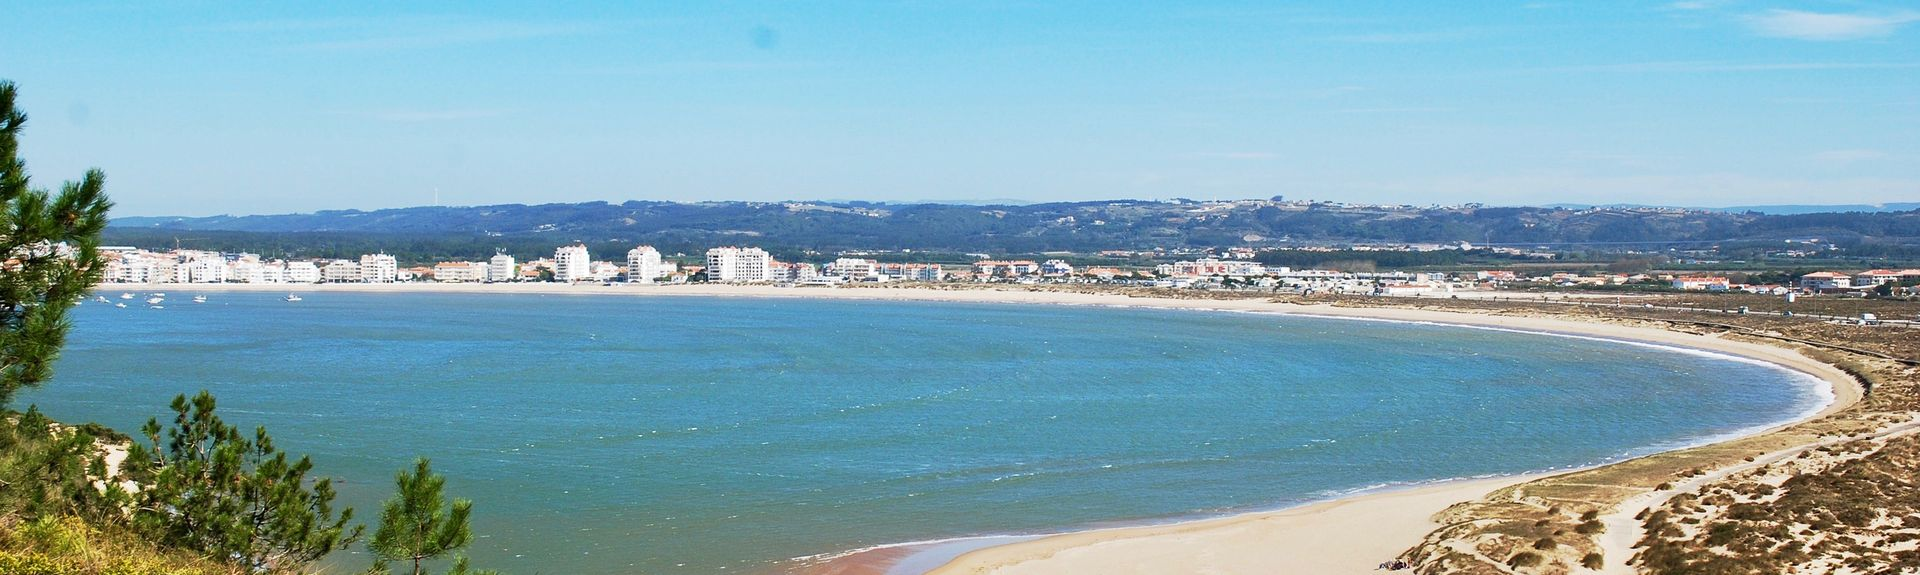 Carvalhal Bemfeito, Dystrykt Leiria, Portugalia